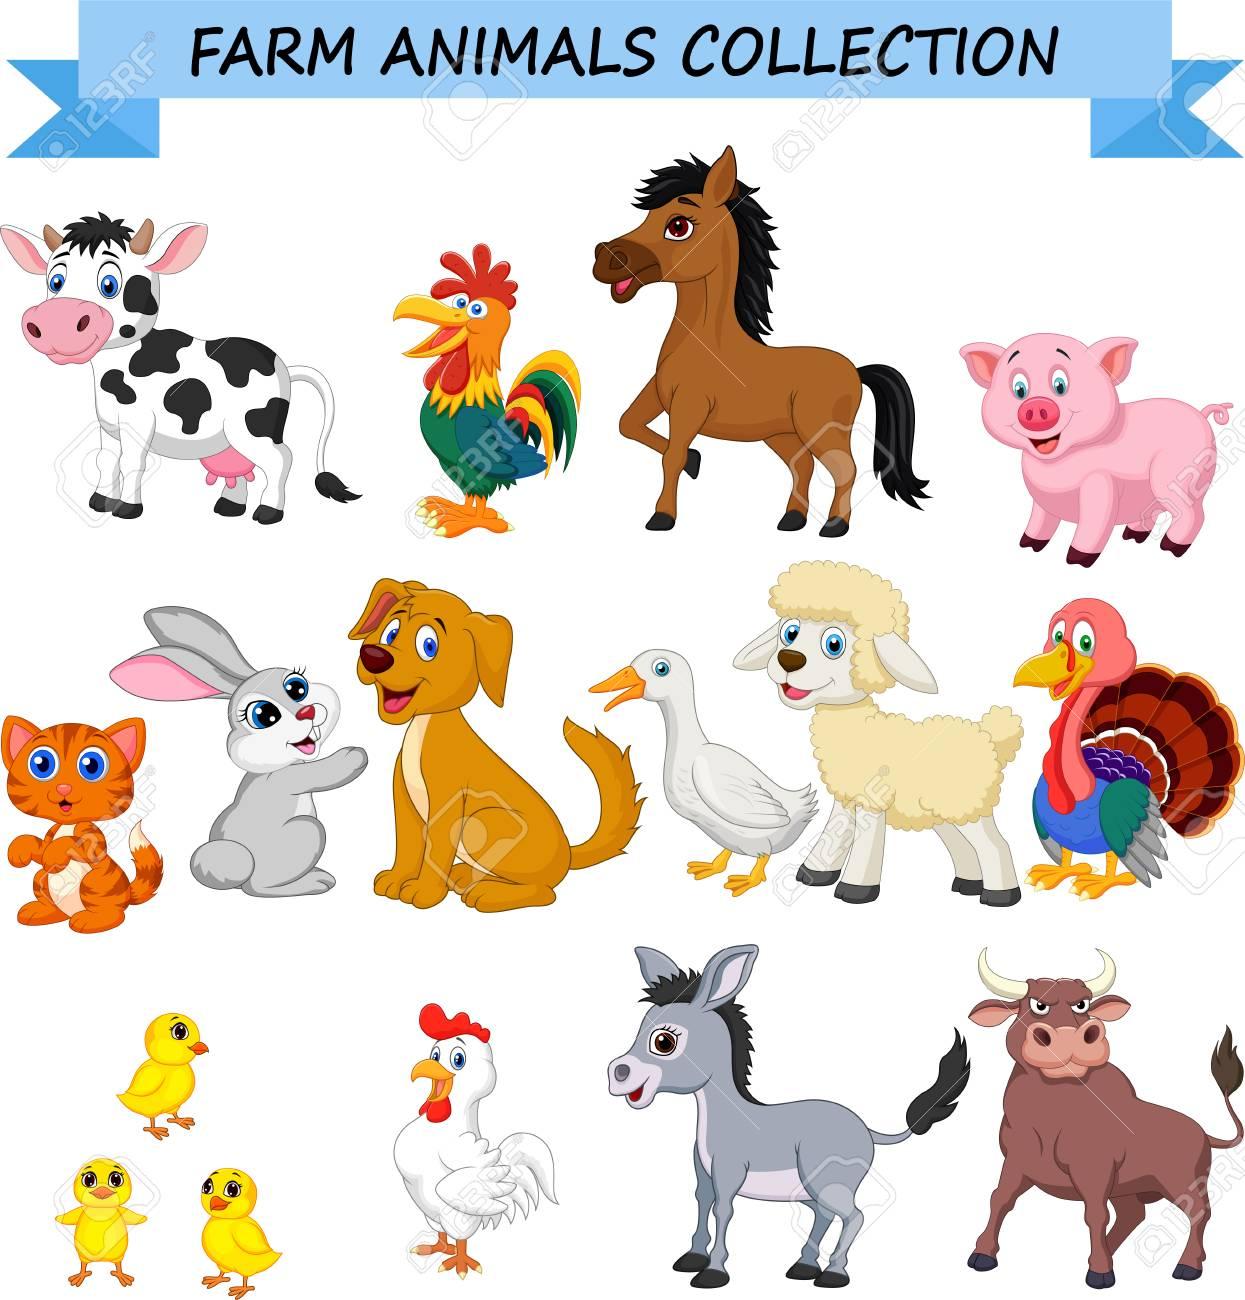 Cartoon farm animals collection - 111519495